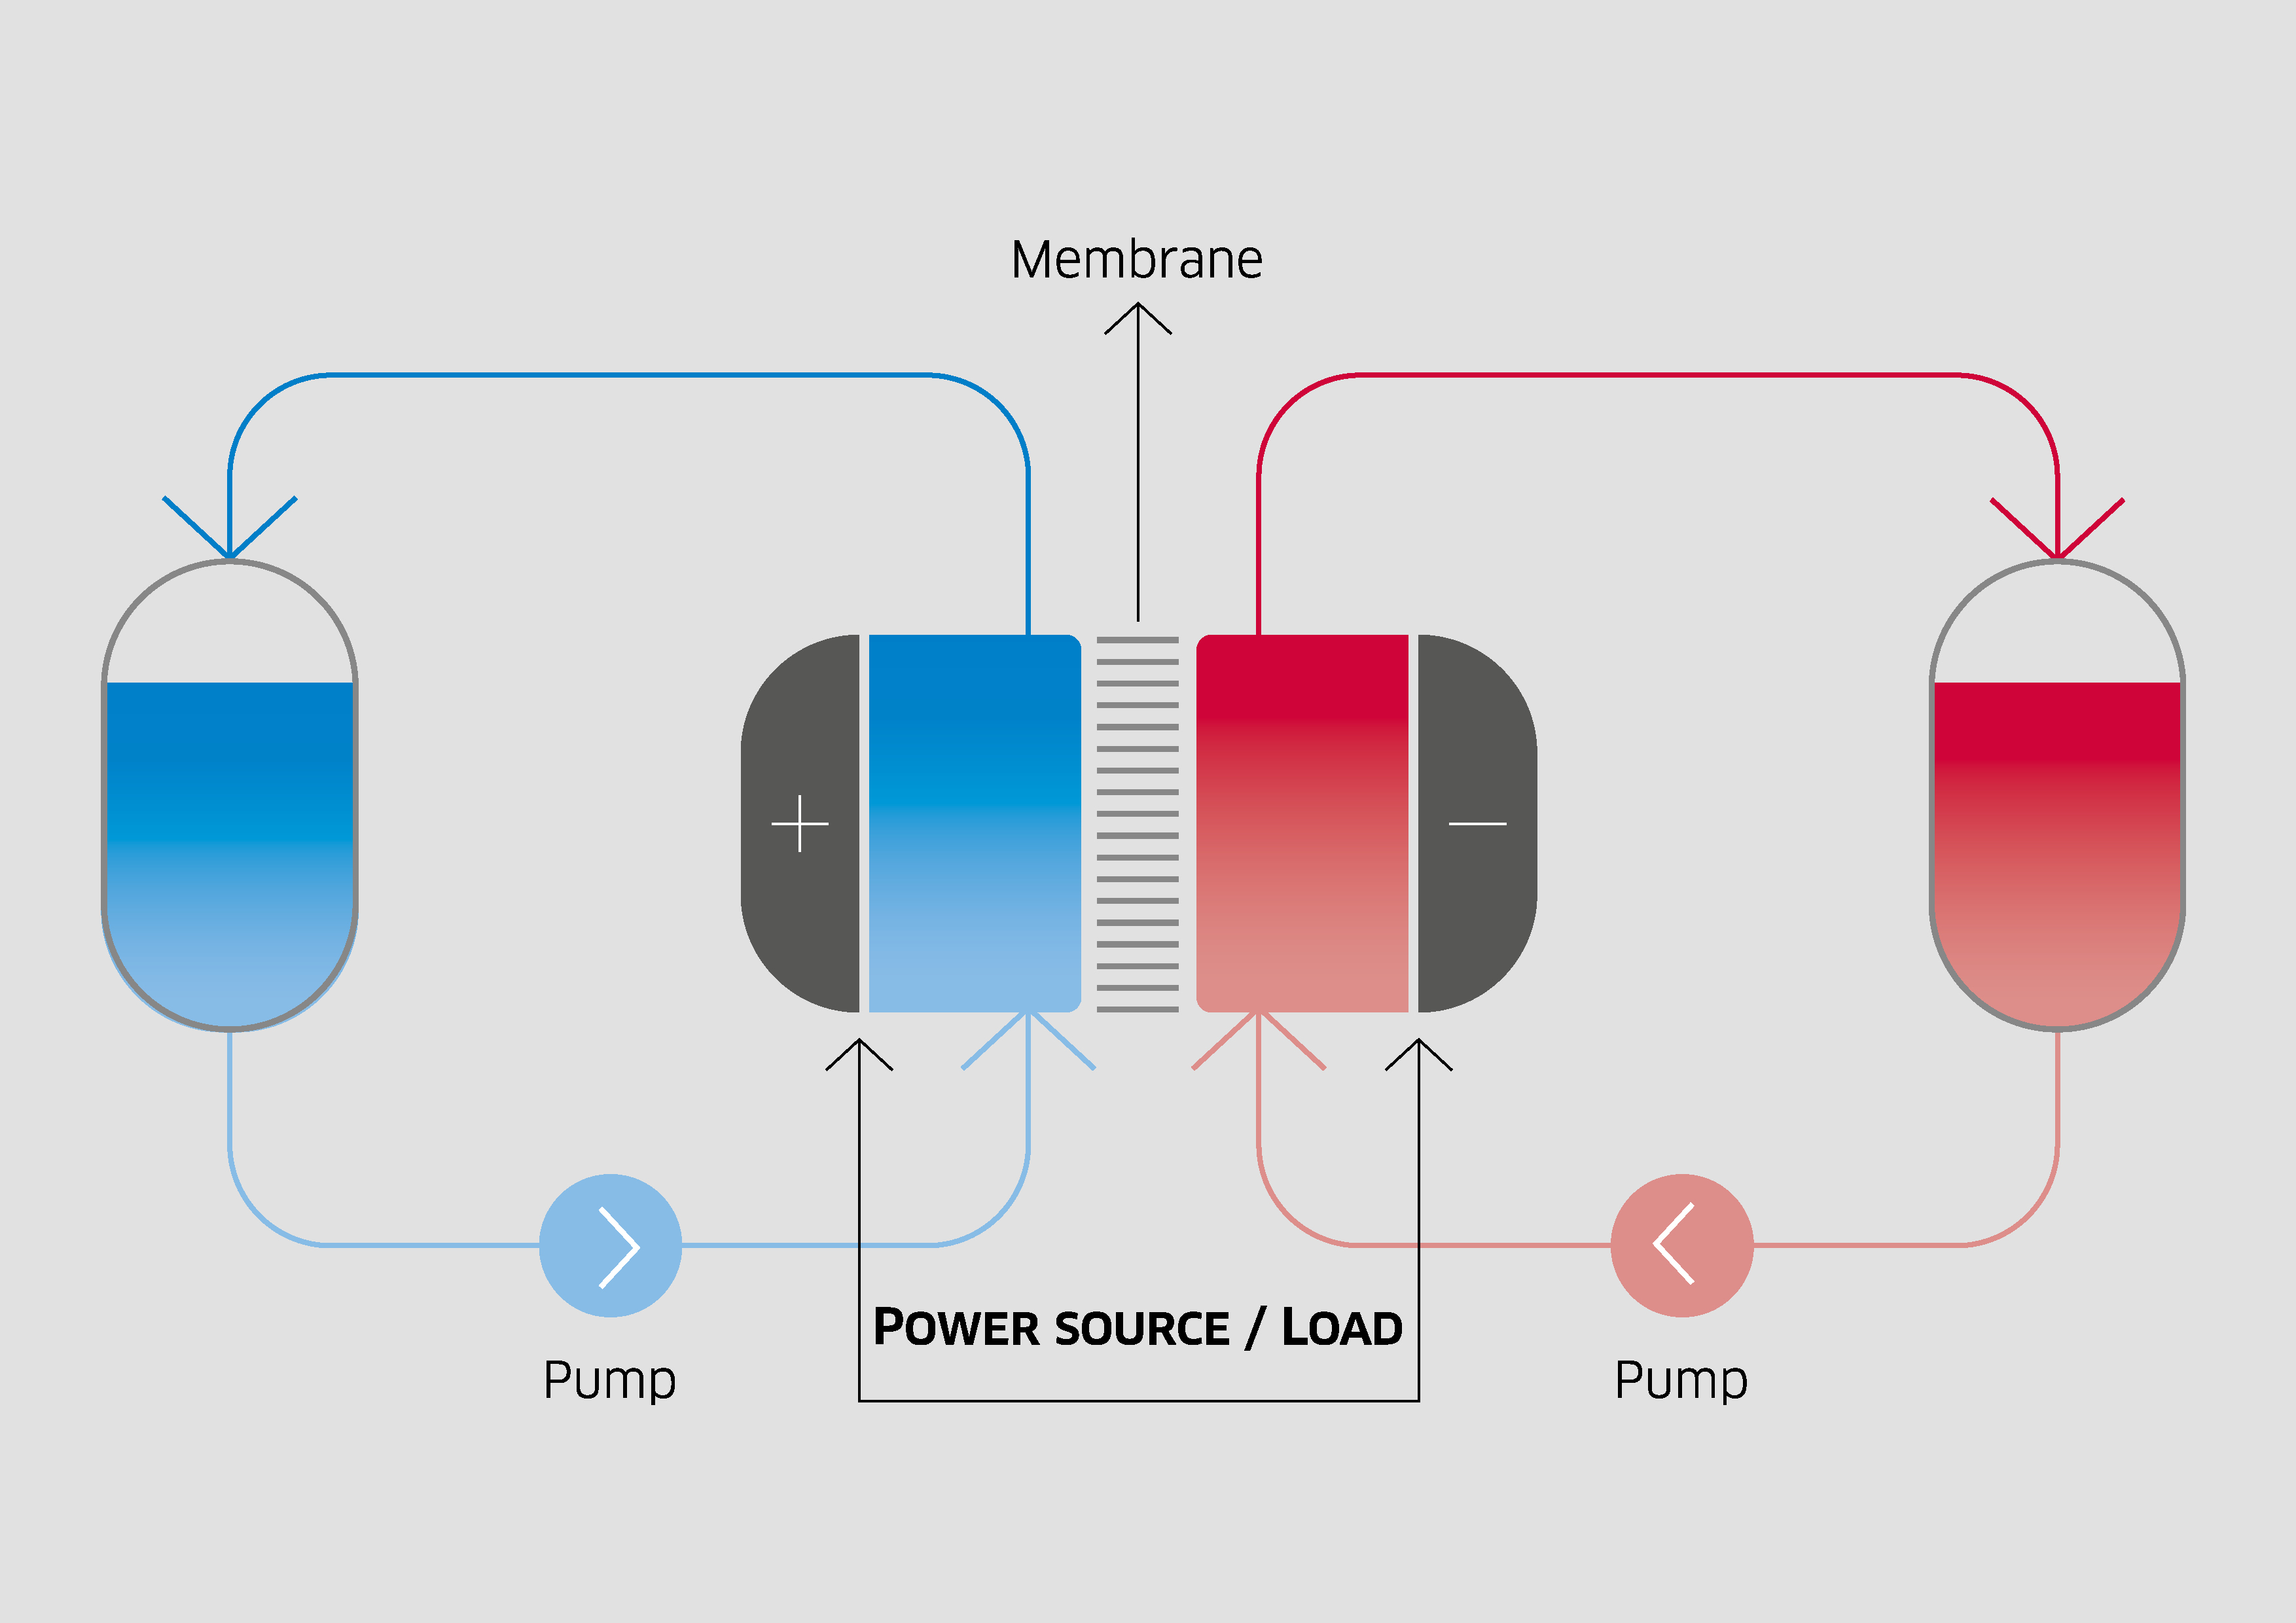 So funktioniert die Technik derRedox-Flow-Batterie.